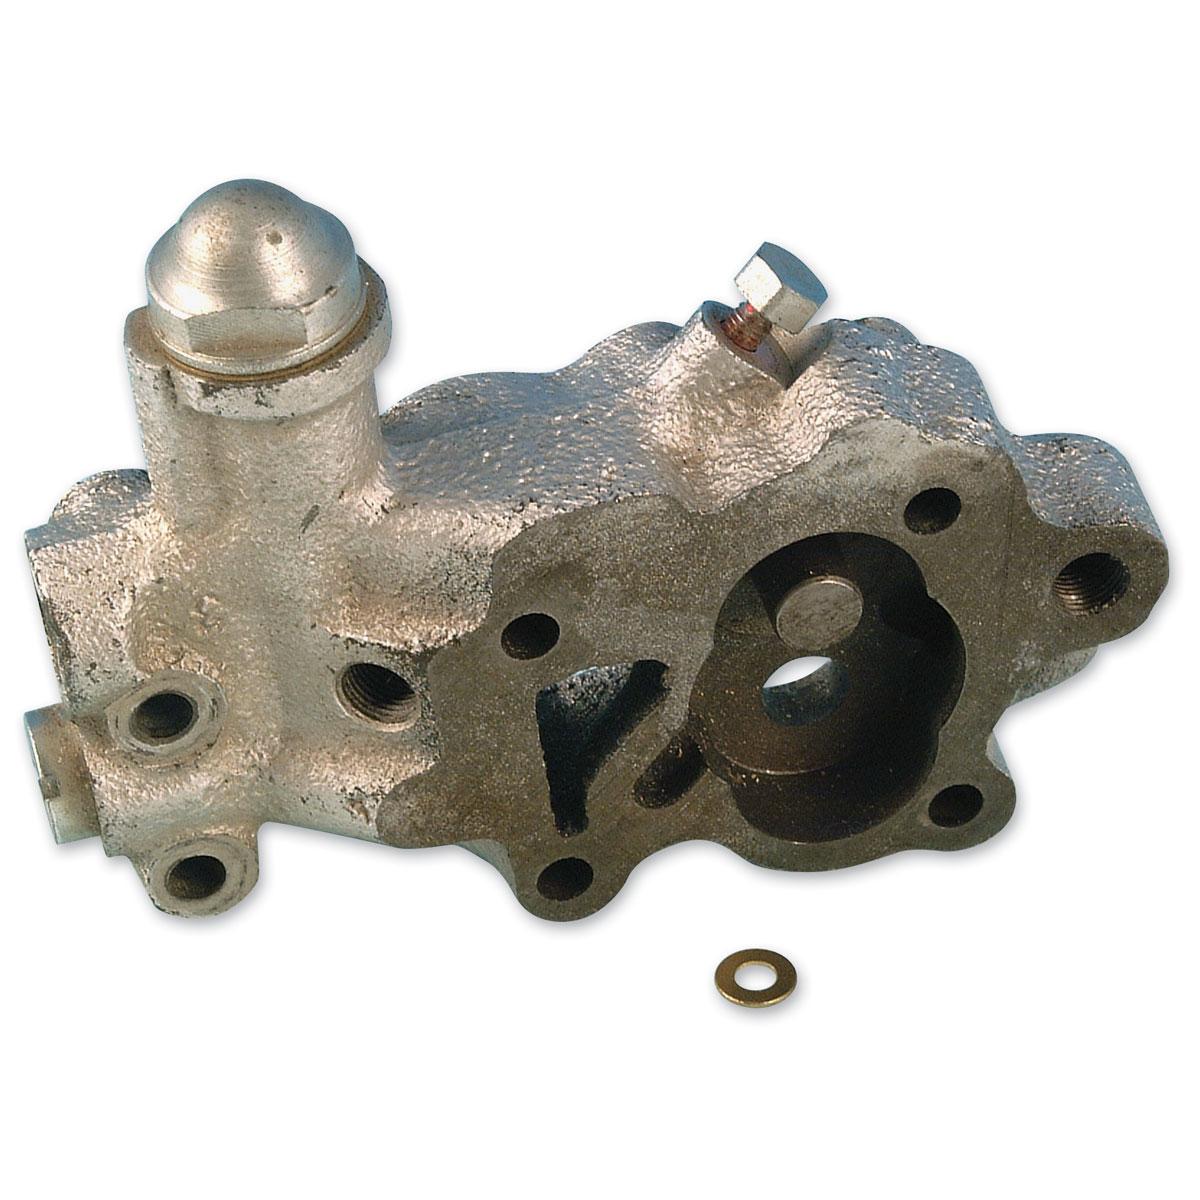 Genuine James Oil Pump Adjuster Screw Washer